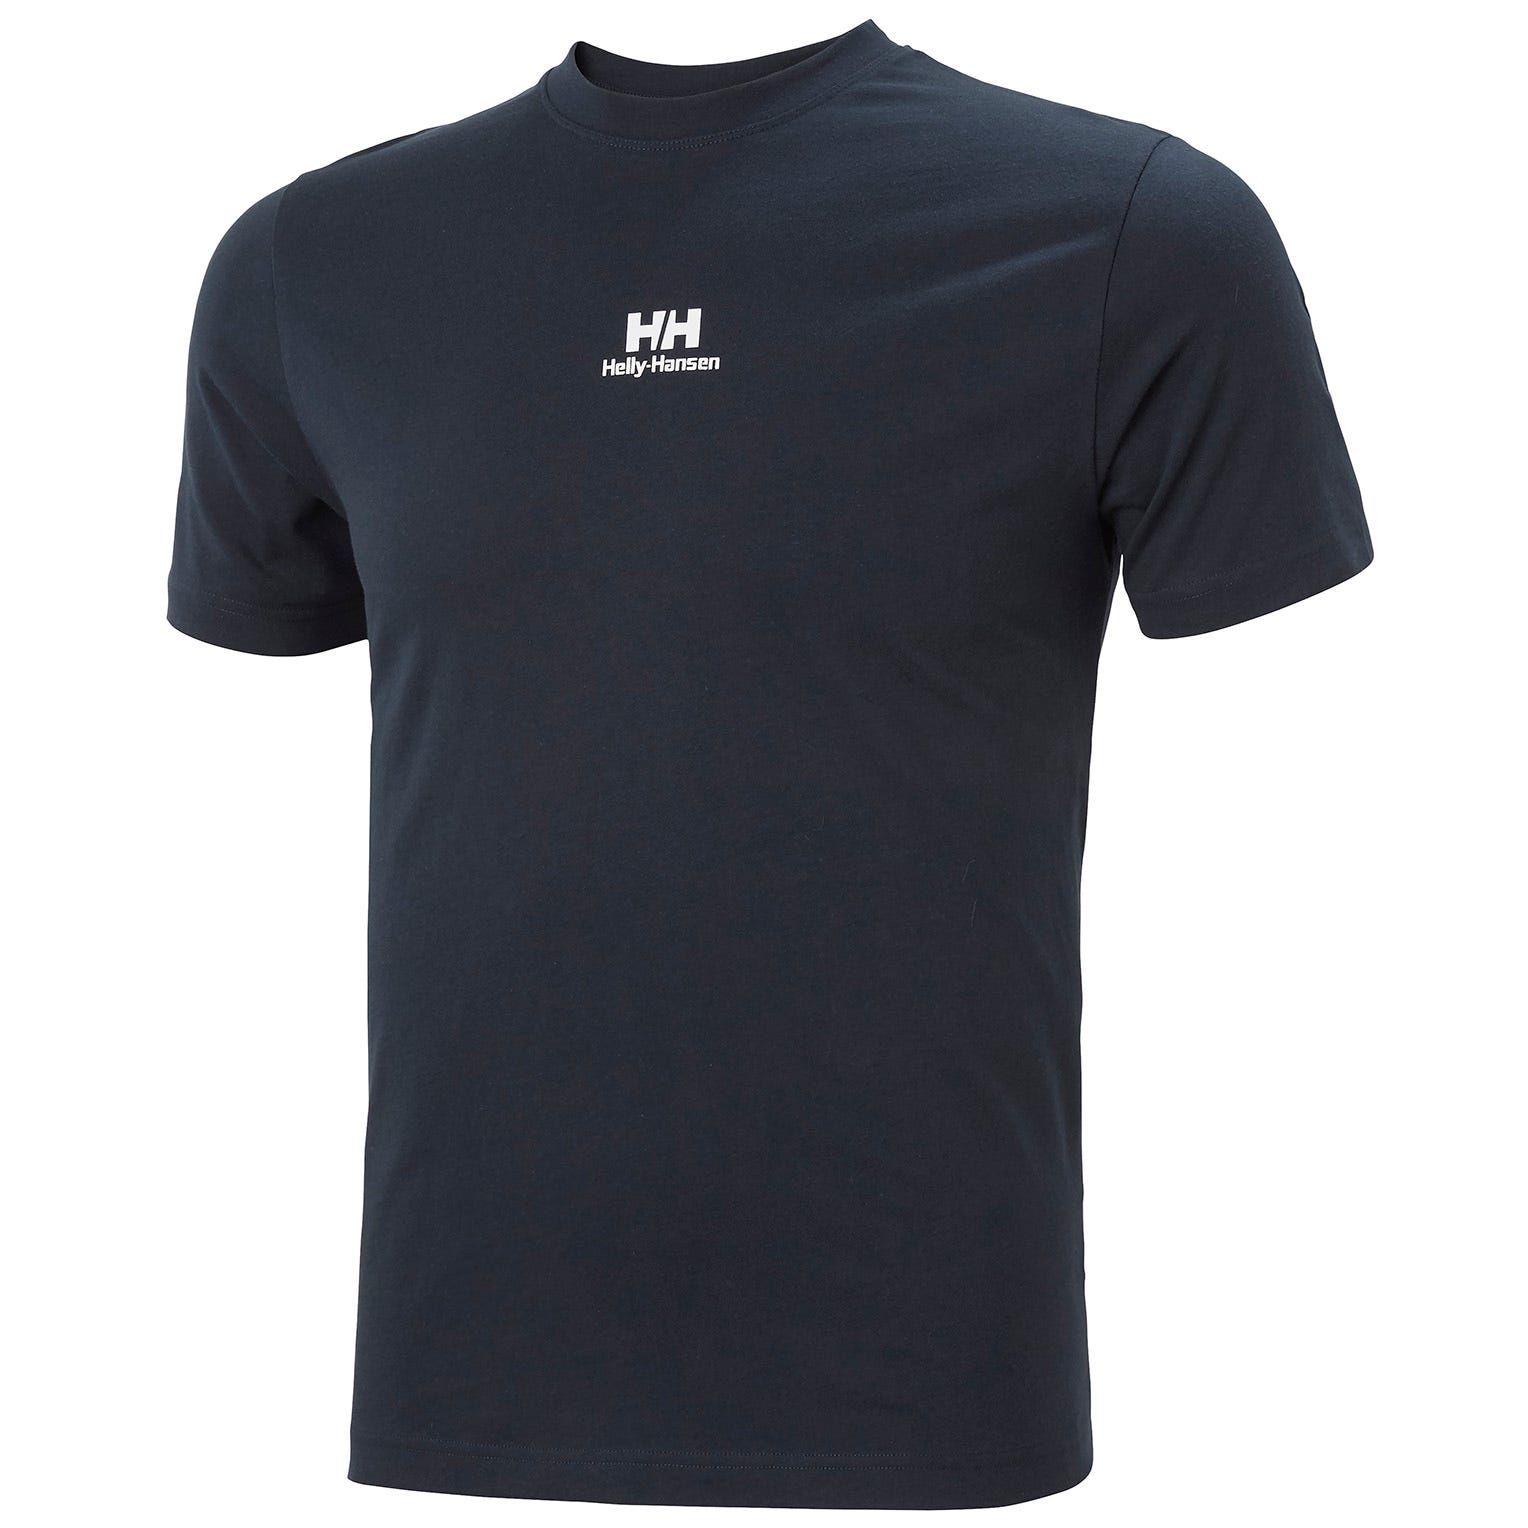 Helly Hansen Mens Yu20 Logo Breathable Cotton T-shirt   M Navy